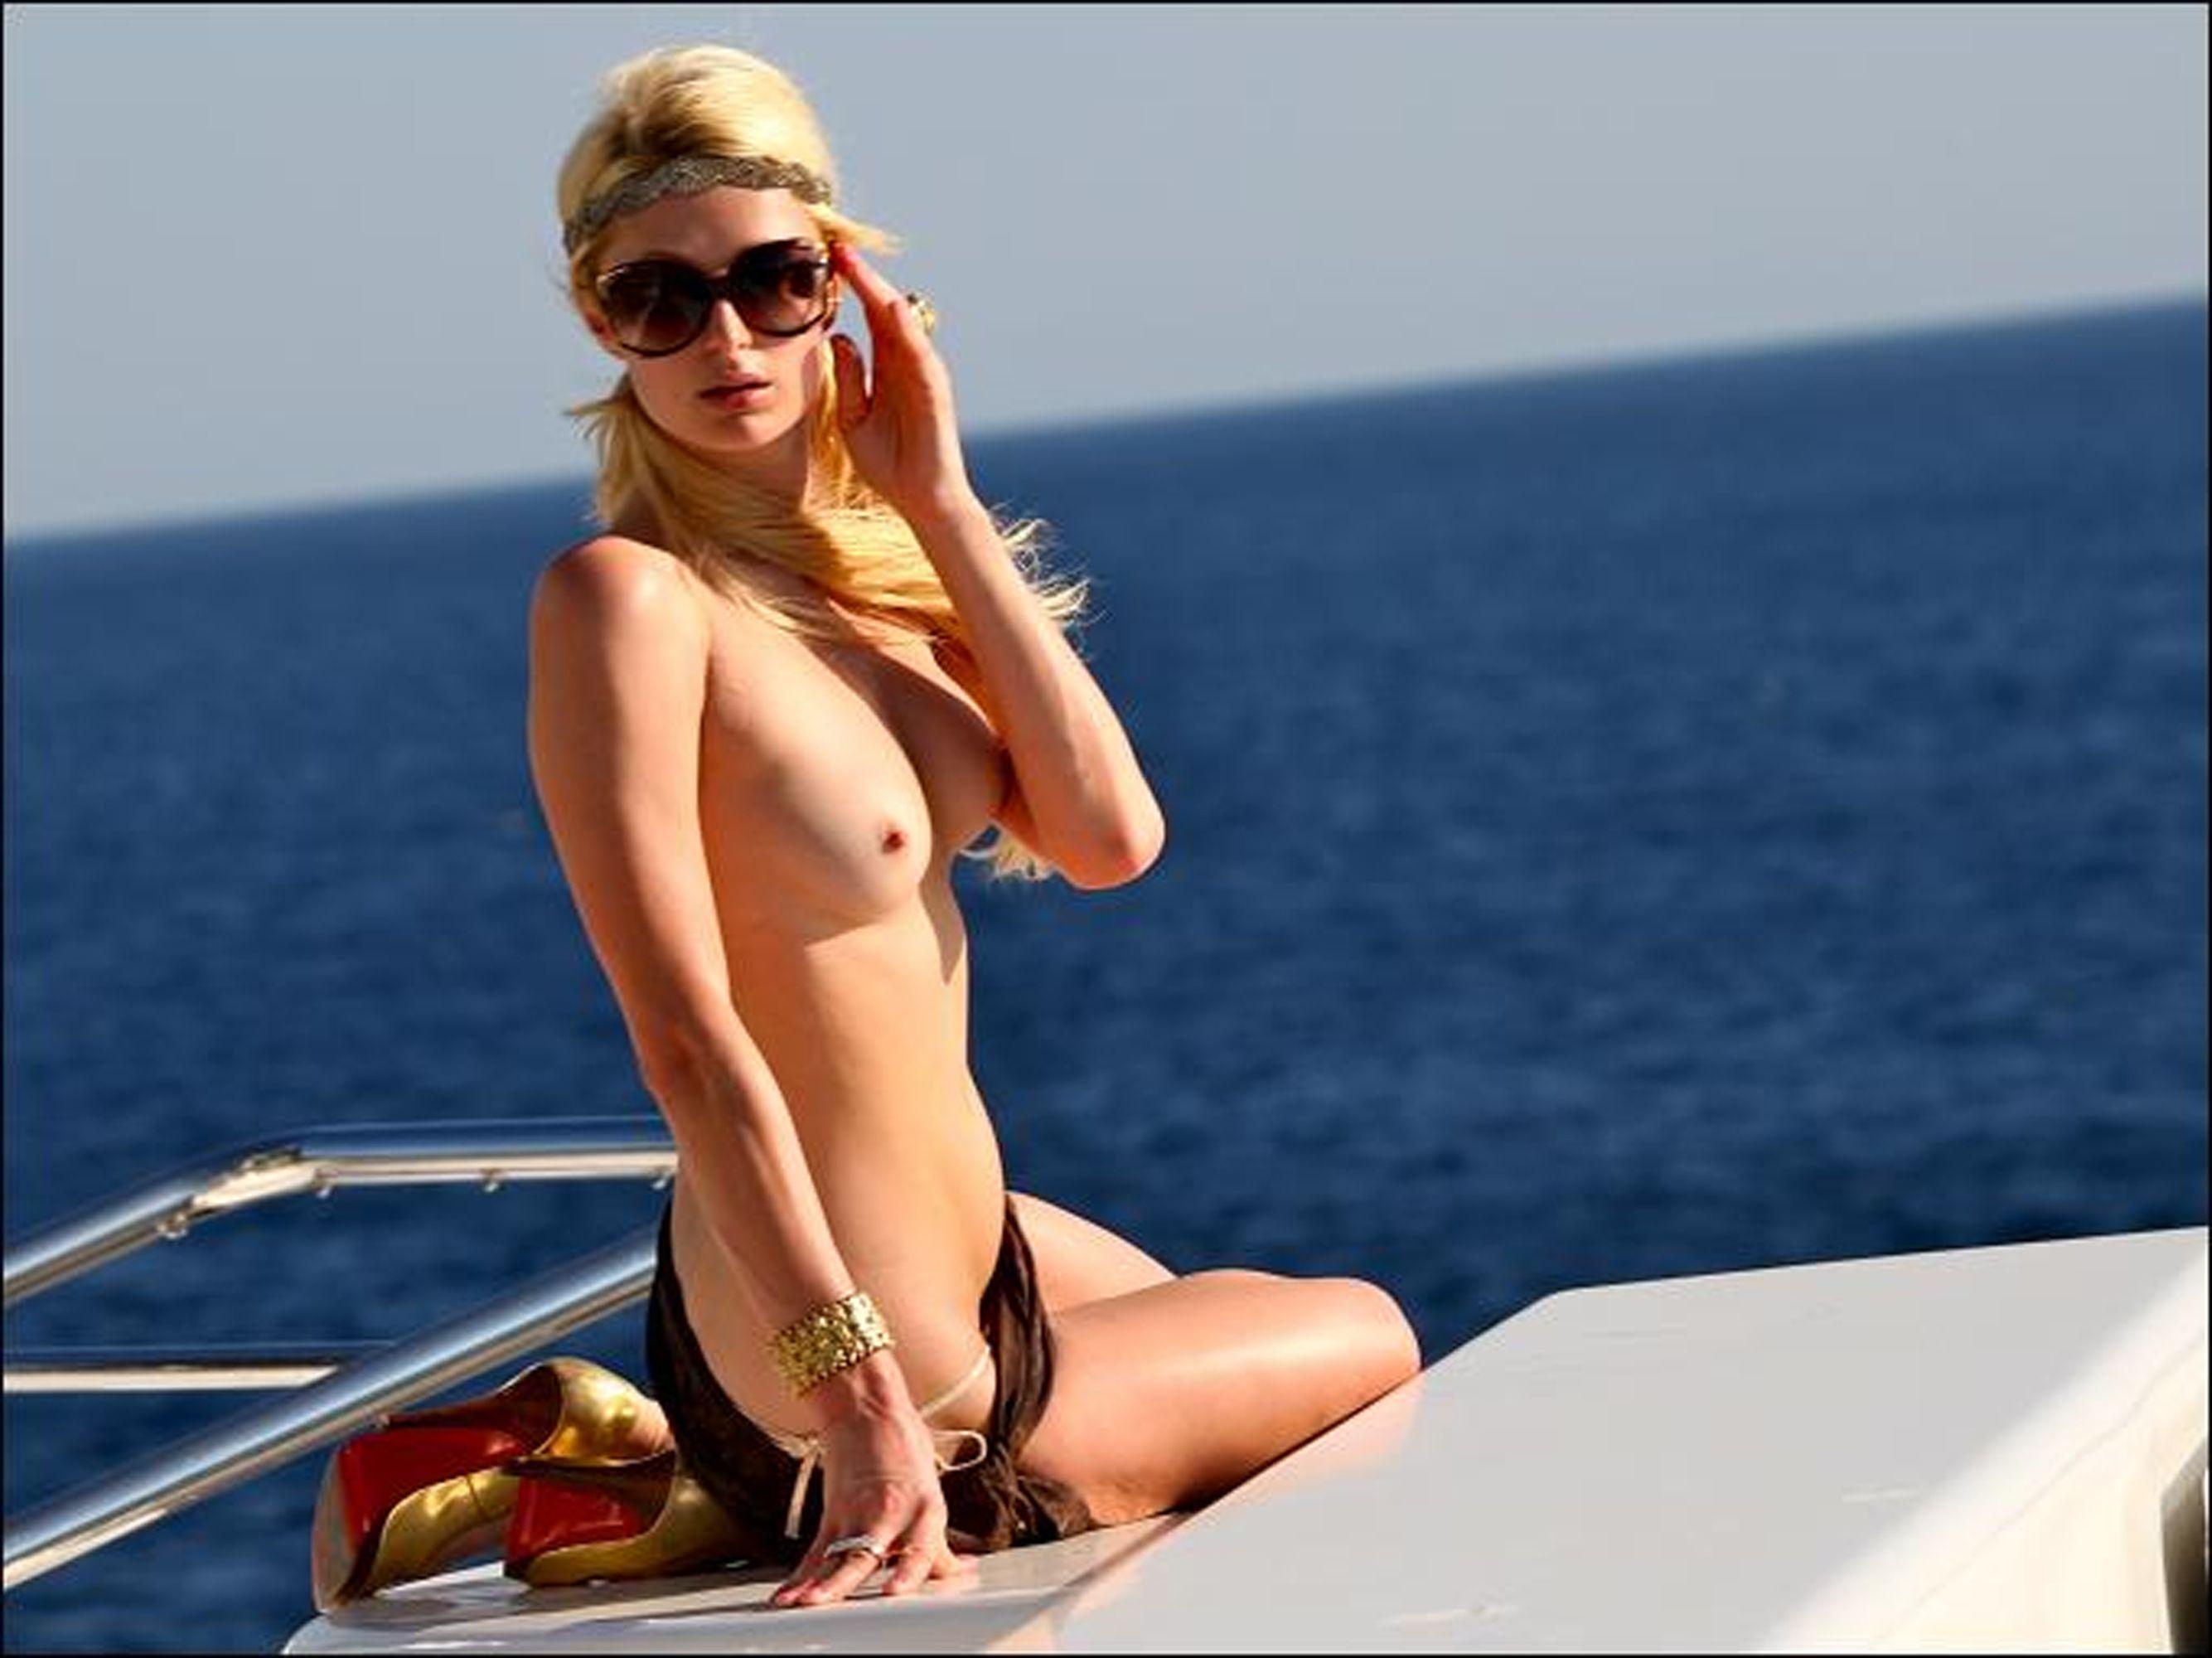 Paris Hilton doggystyle